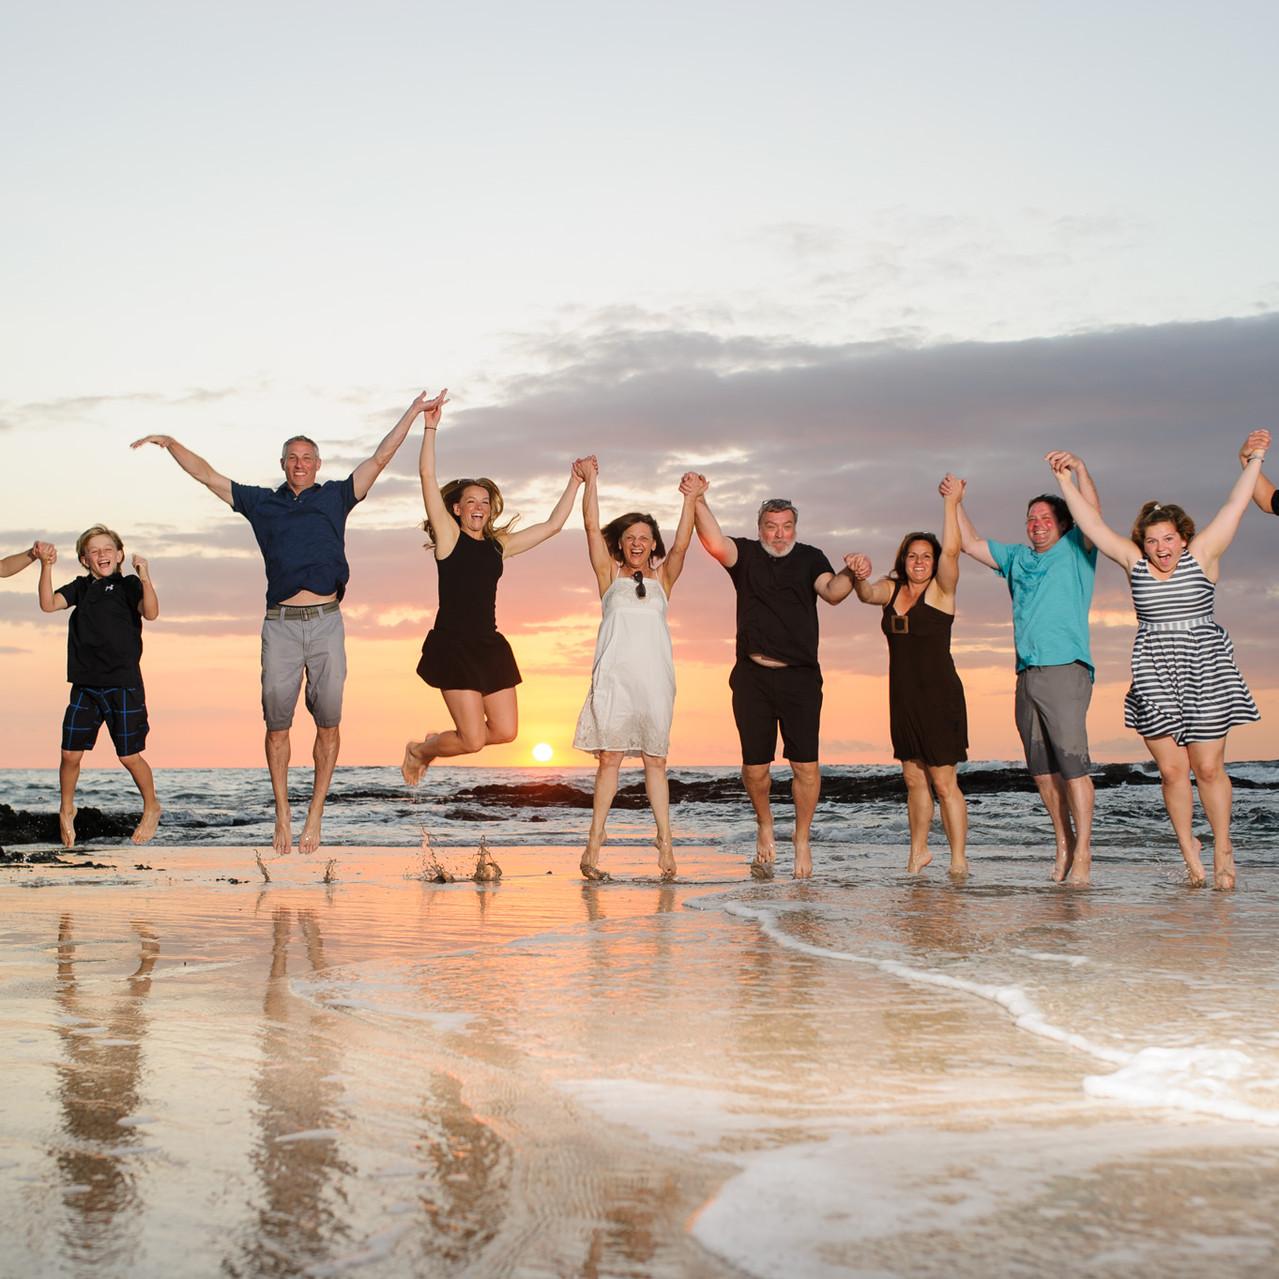 Family reunion photo shoot at Crystal Sands Playa Langosta